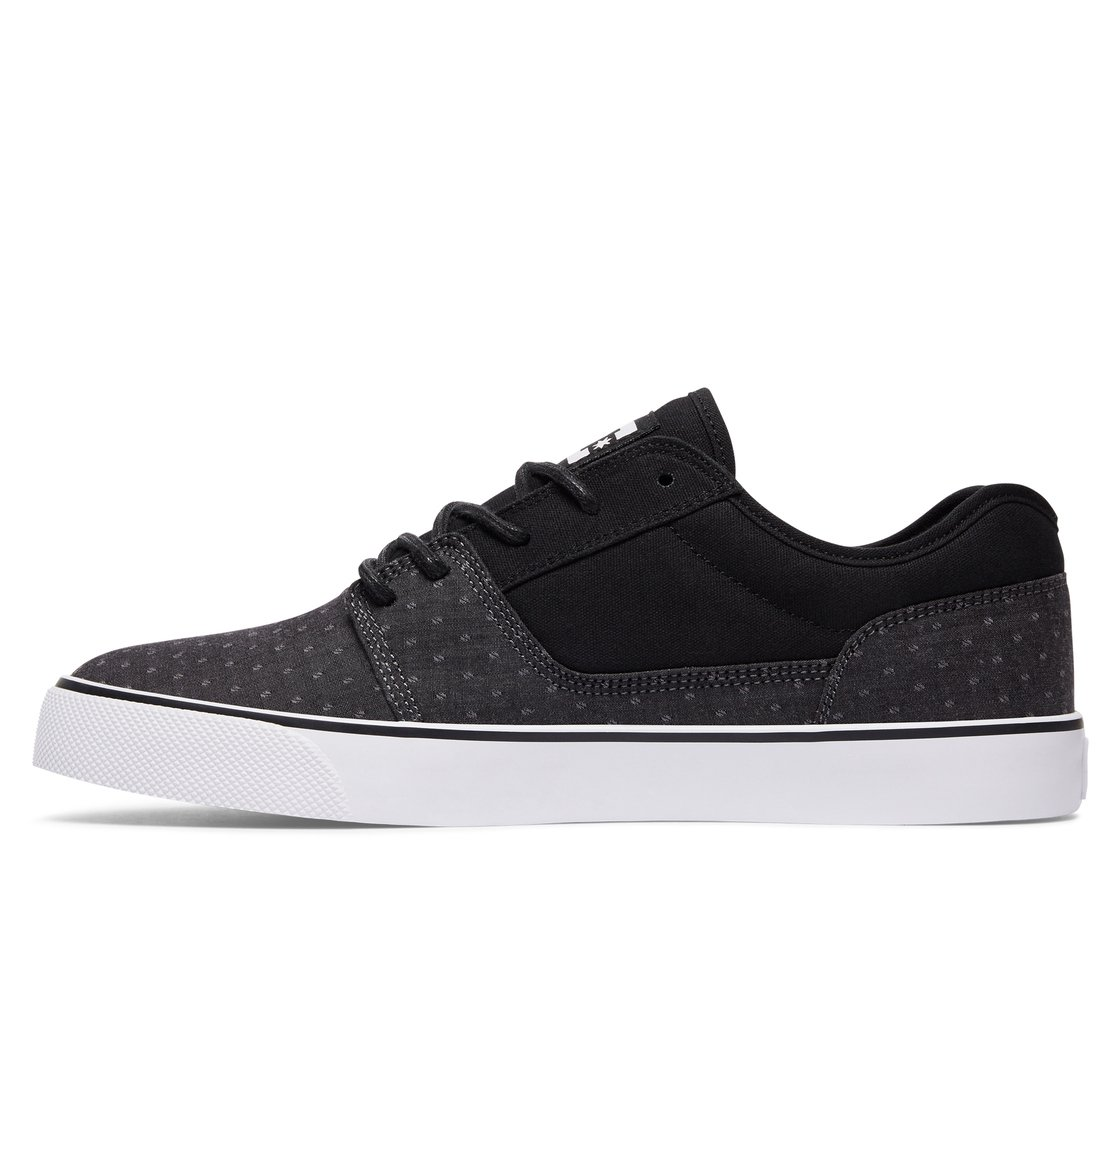 DC Tonik TX SE Sneakers 73T53KES